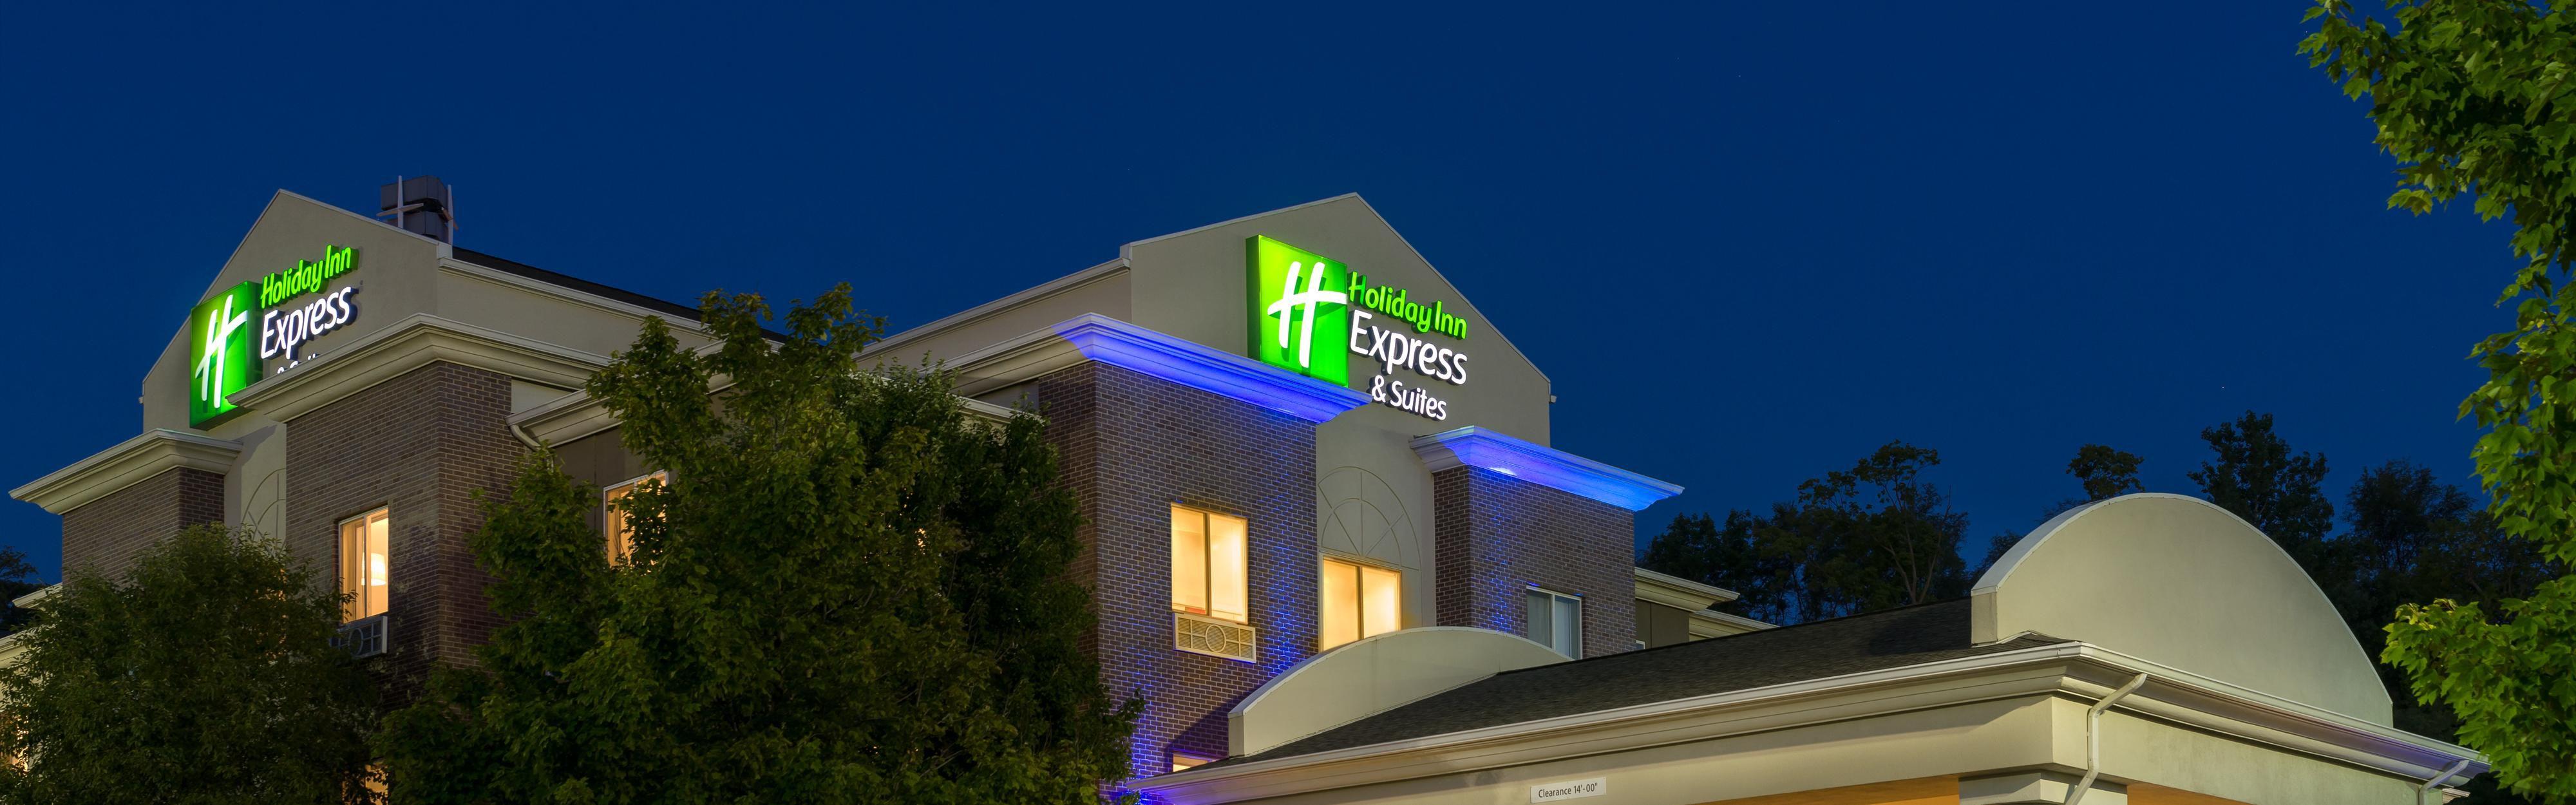 Holiday Inn Express Suites Independence Kansas City Independence Missouri Mo